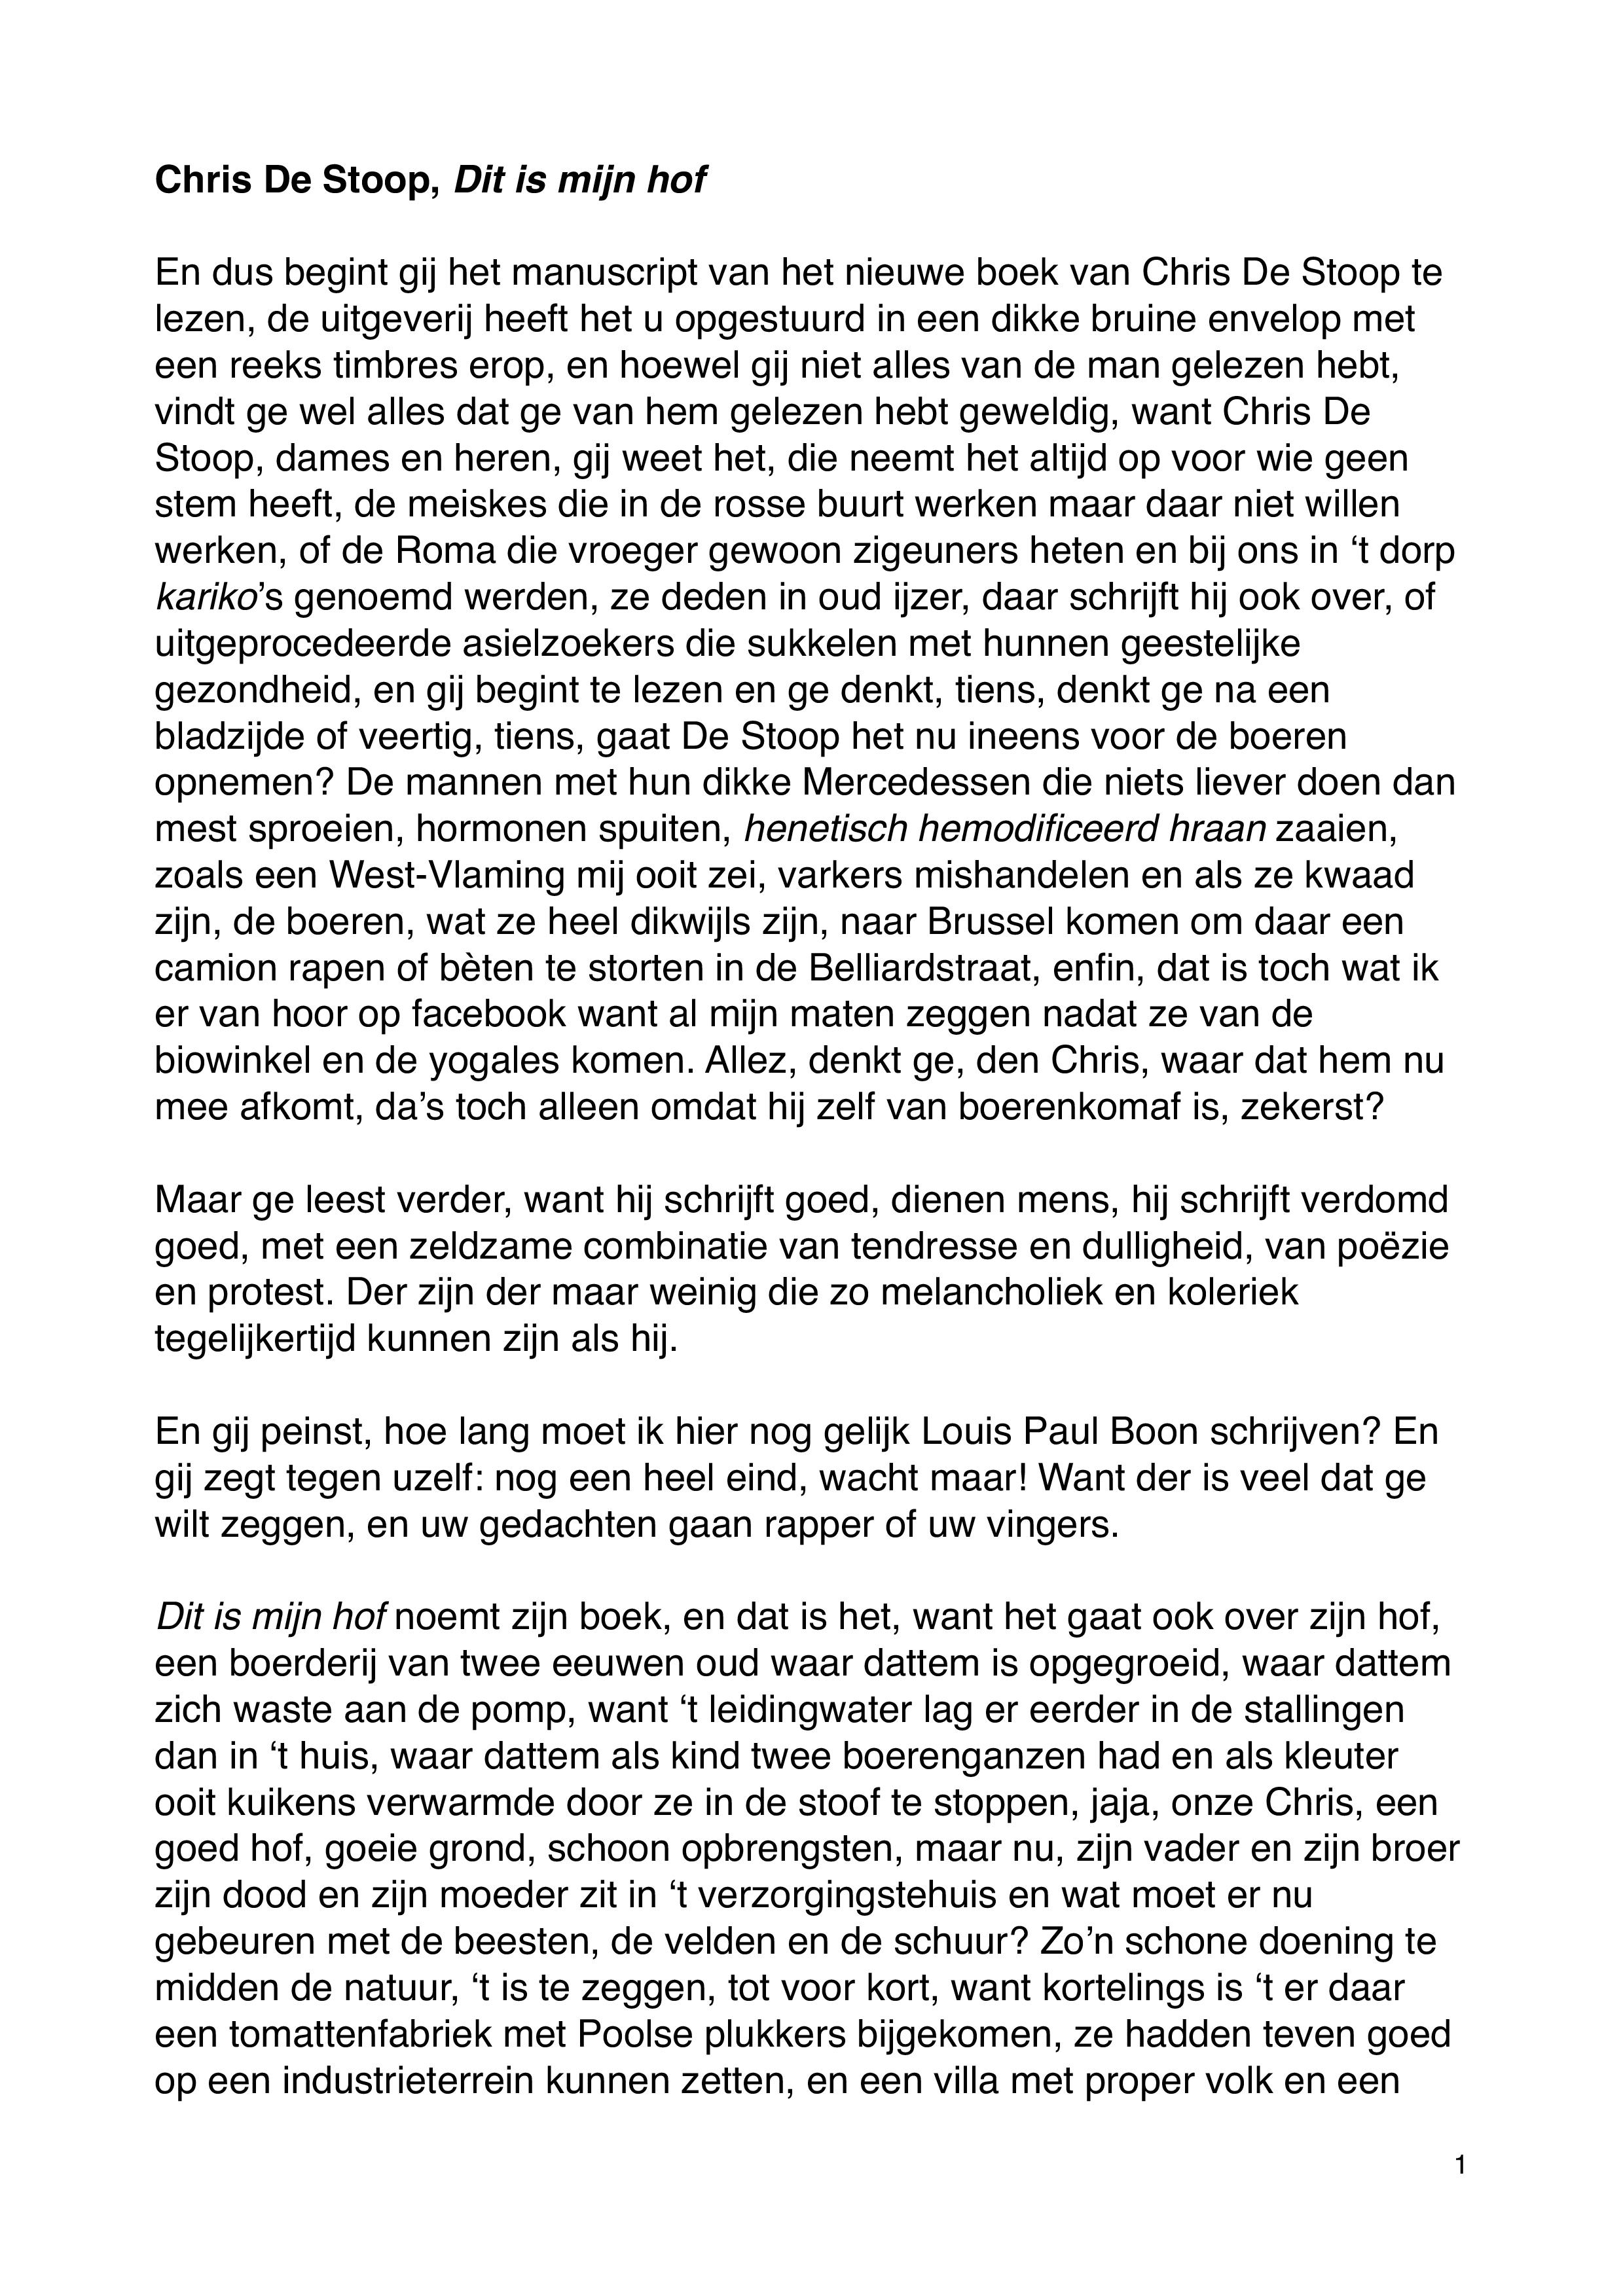 Chris De Stoop - inleiding